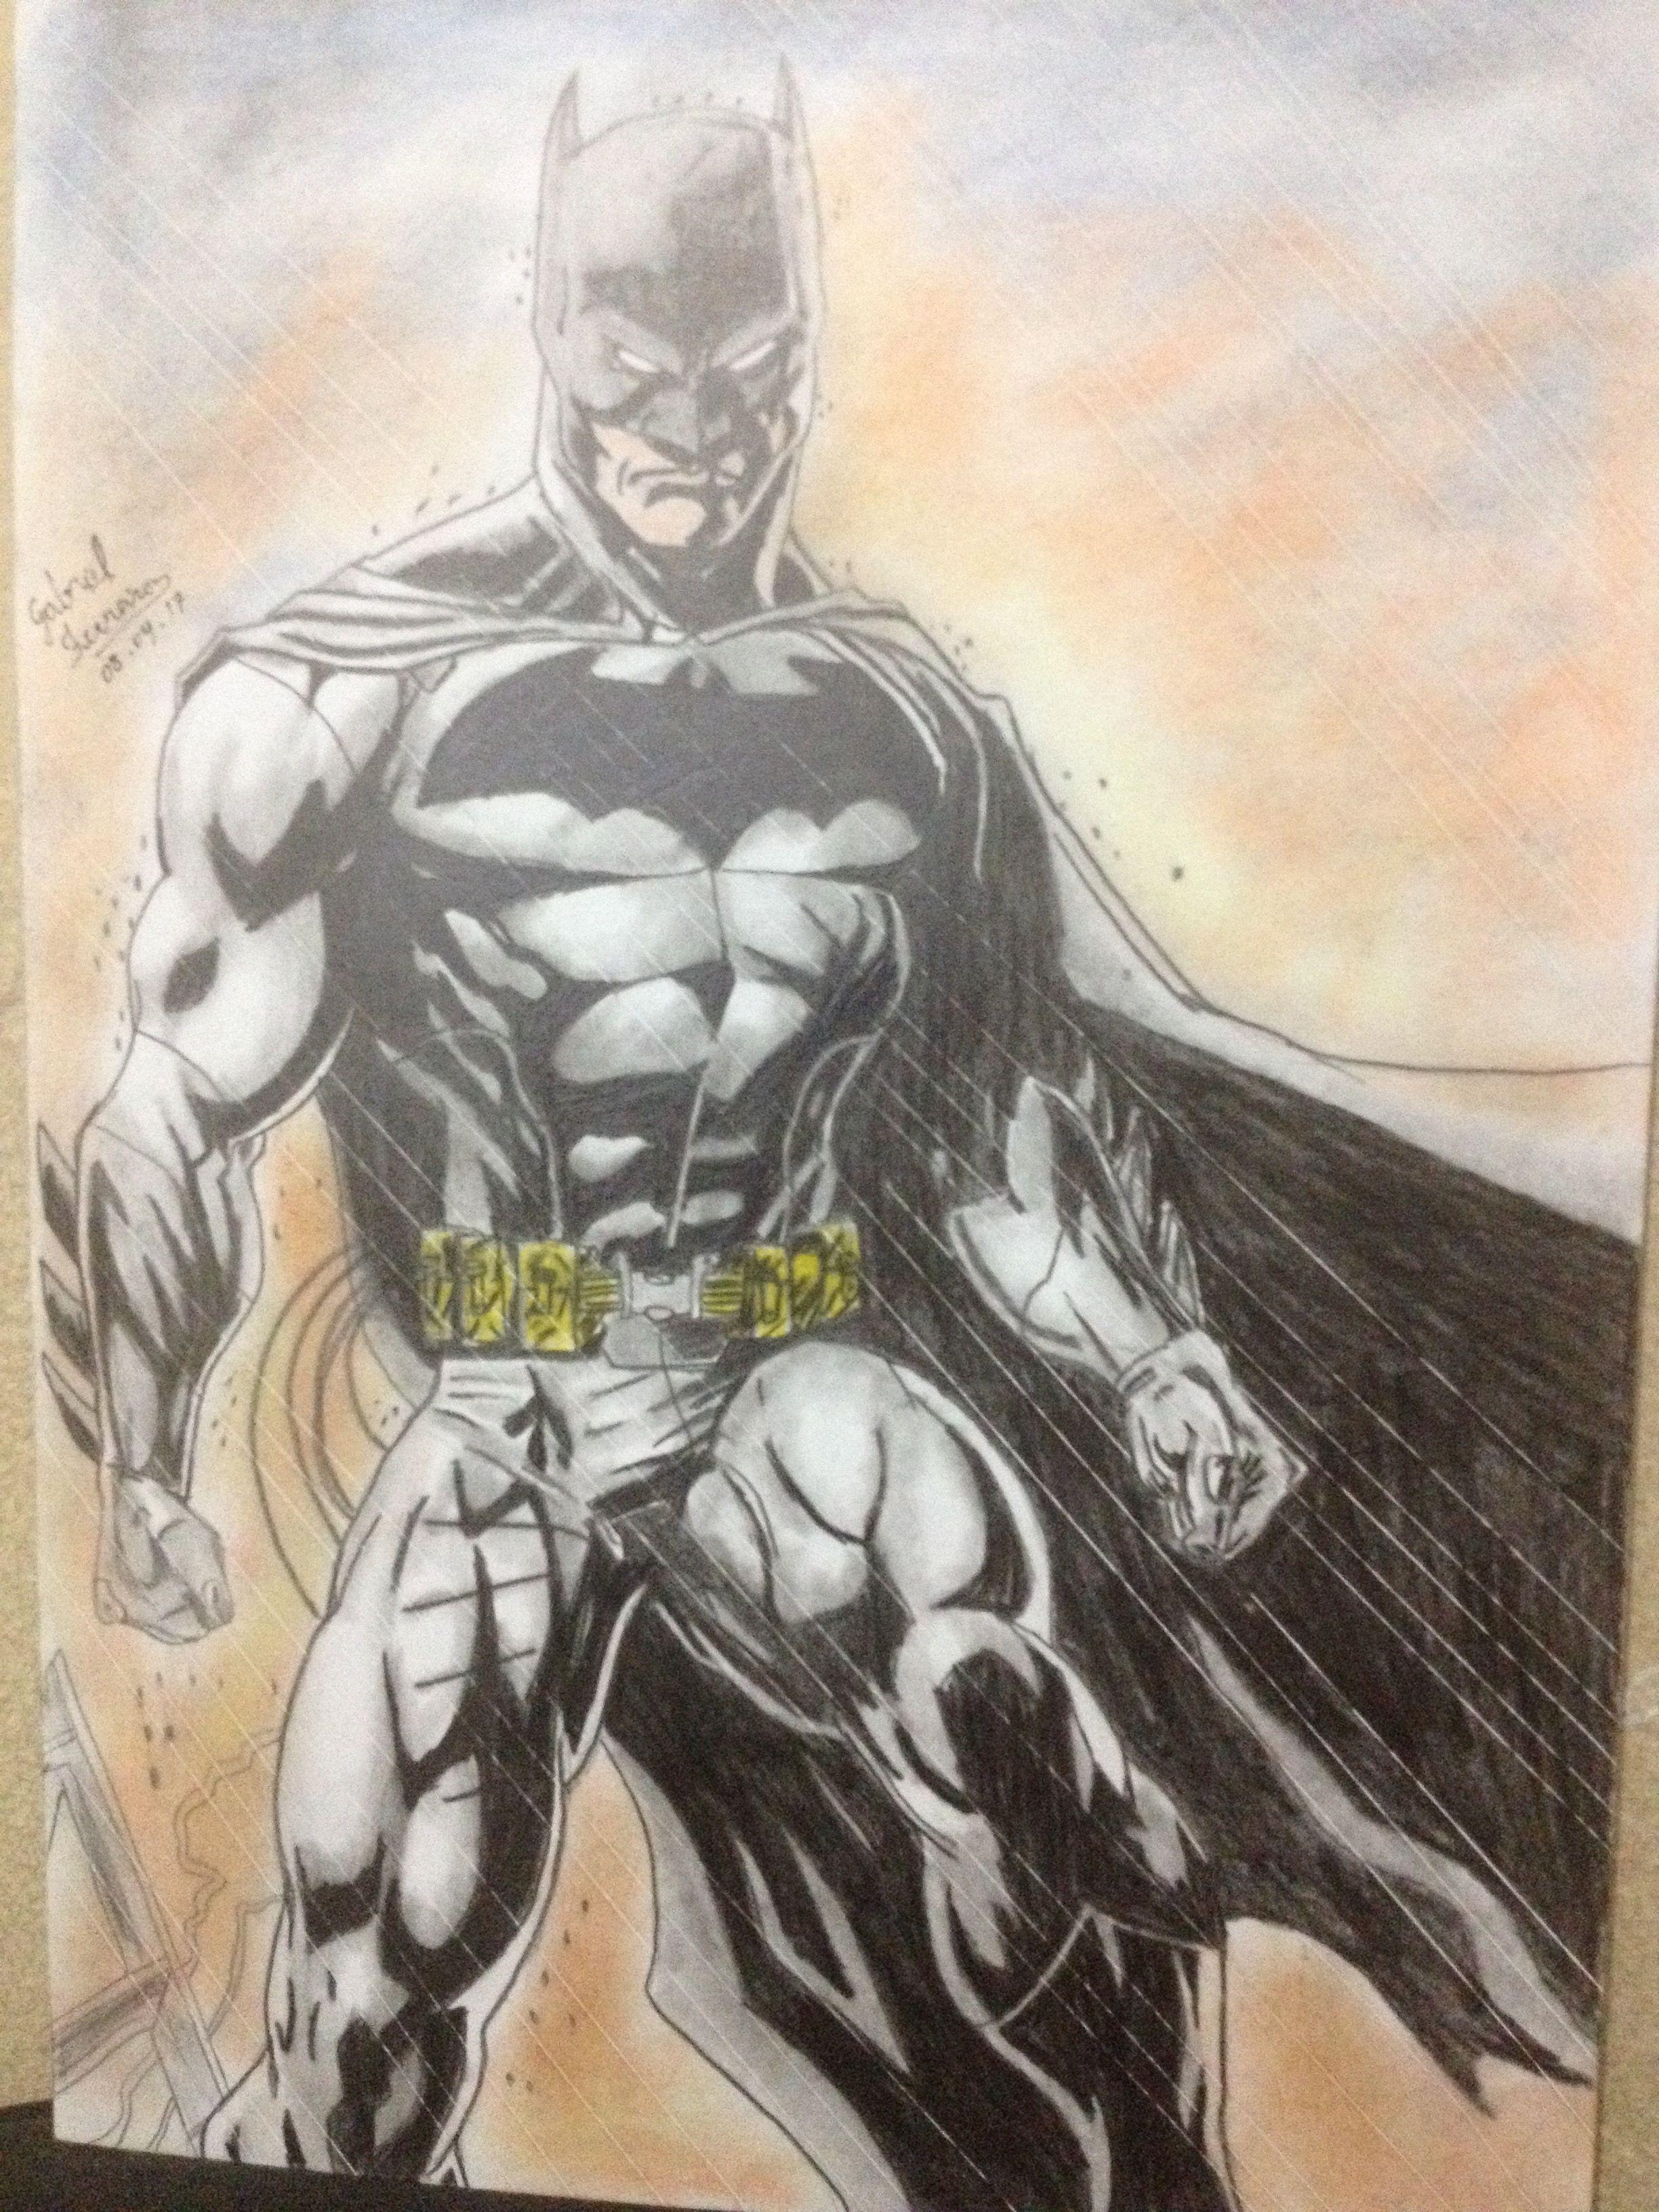 Gabrielartdraw Batman Desenho Realista Gabrielferreira Batman